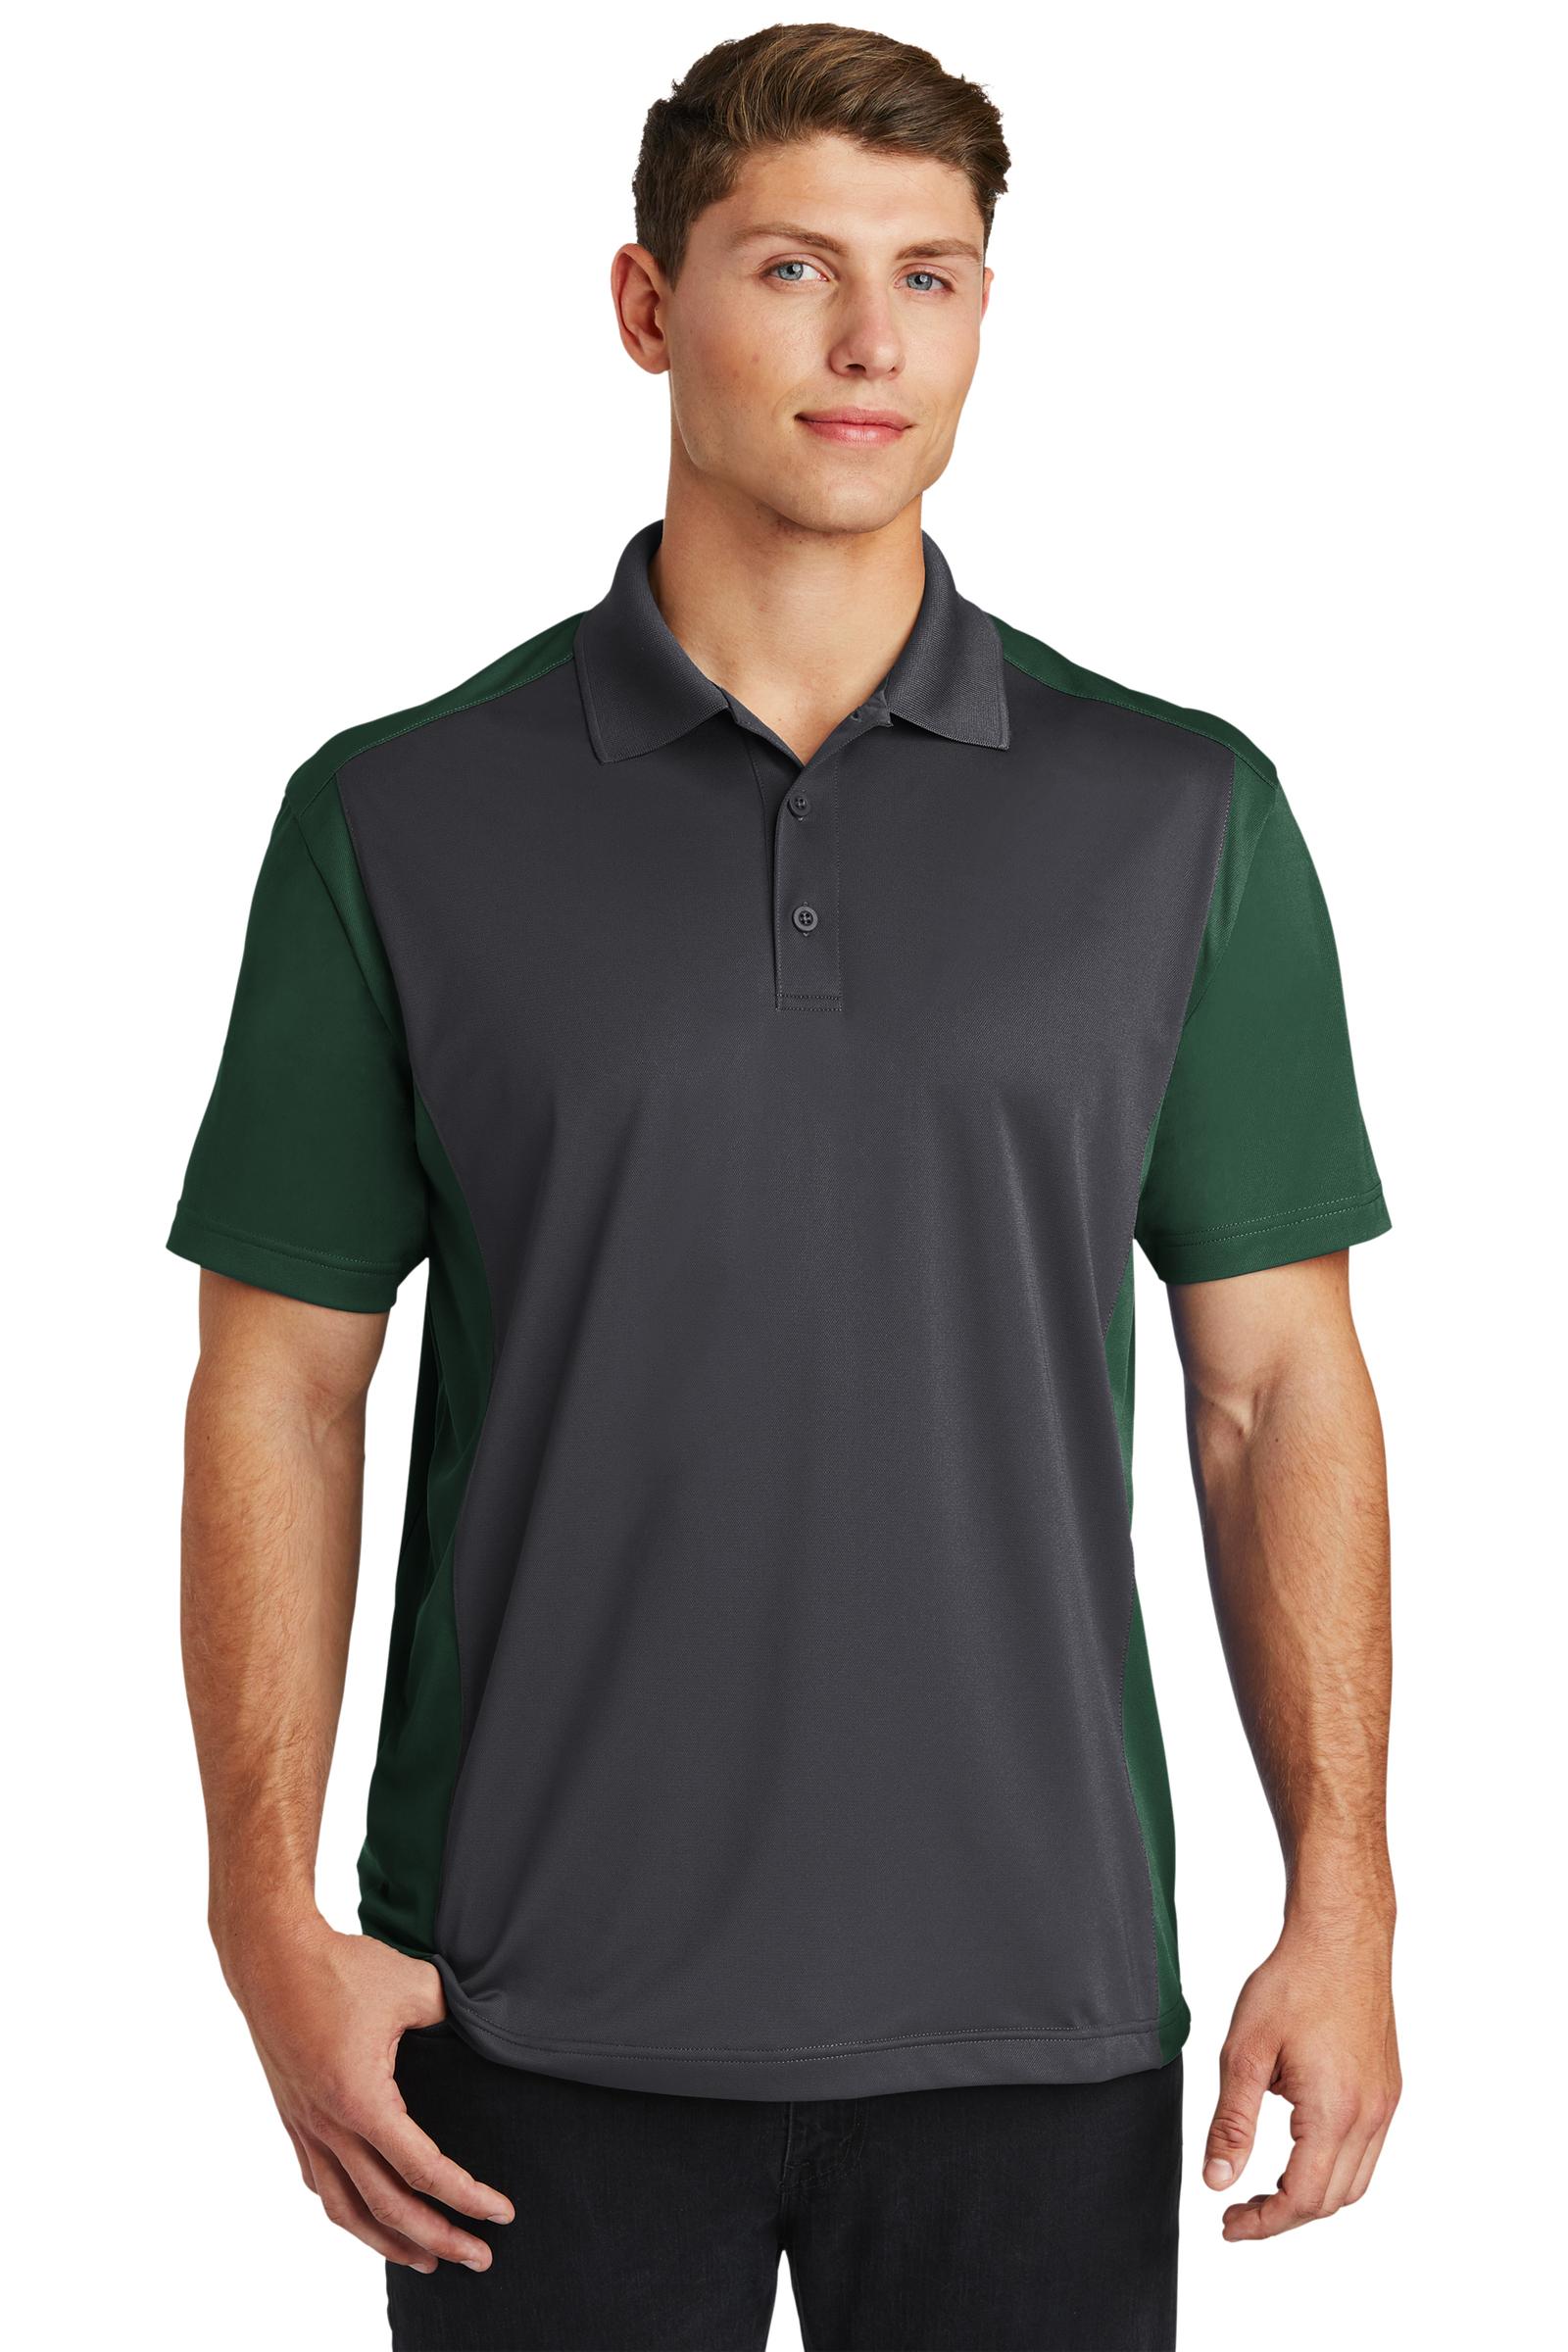 Sport-Tek Embroidered Men's Colorblock Micropique Sport-Wick Polo